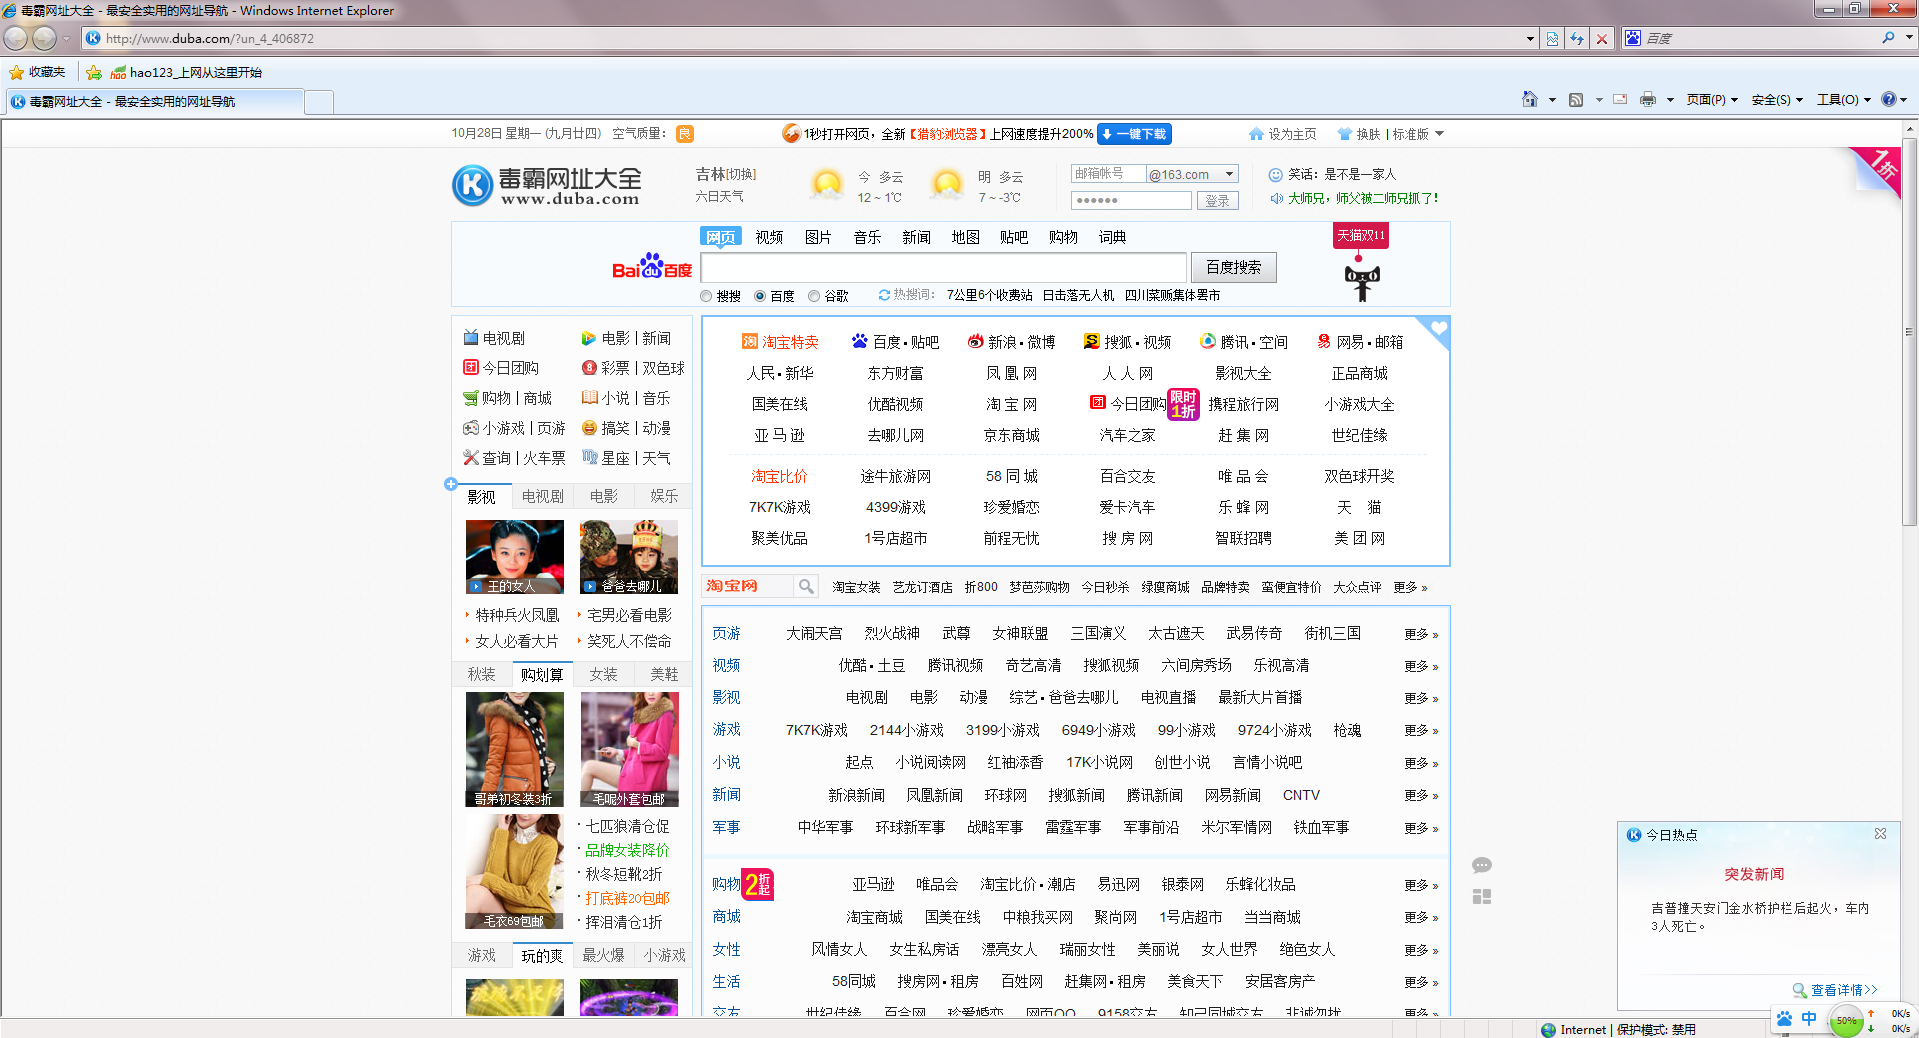 hao123网址大全_浏览器打开的是hao123进入的却是毒霸网址大全_百度知道